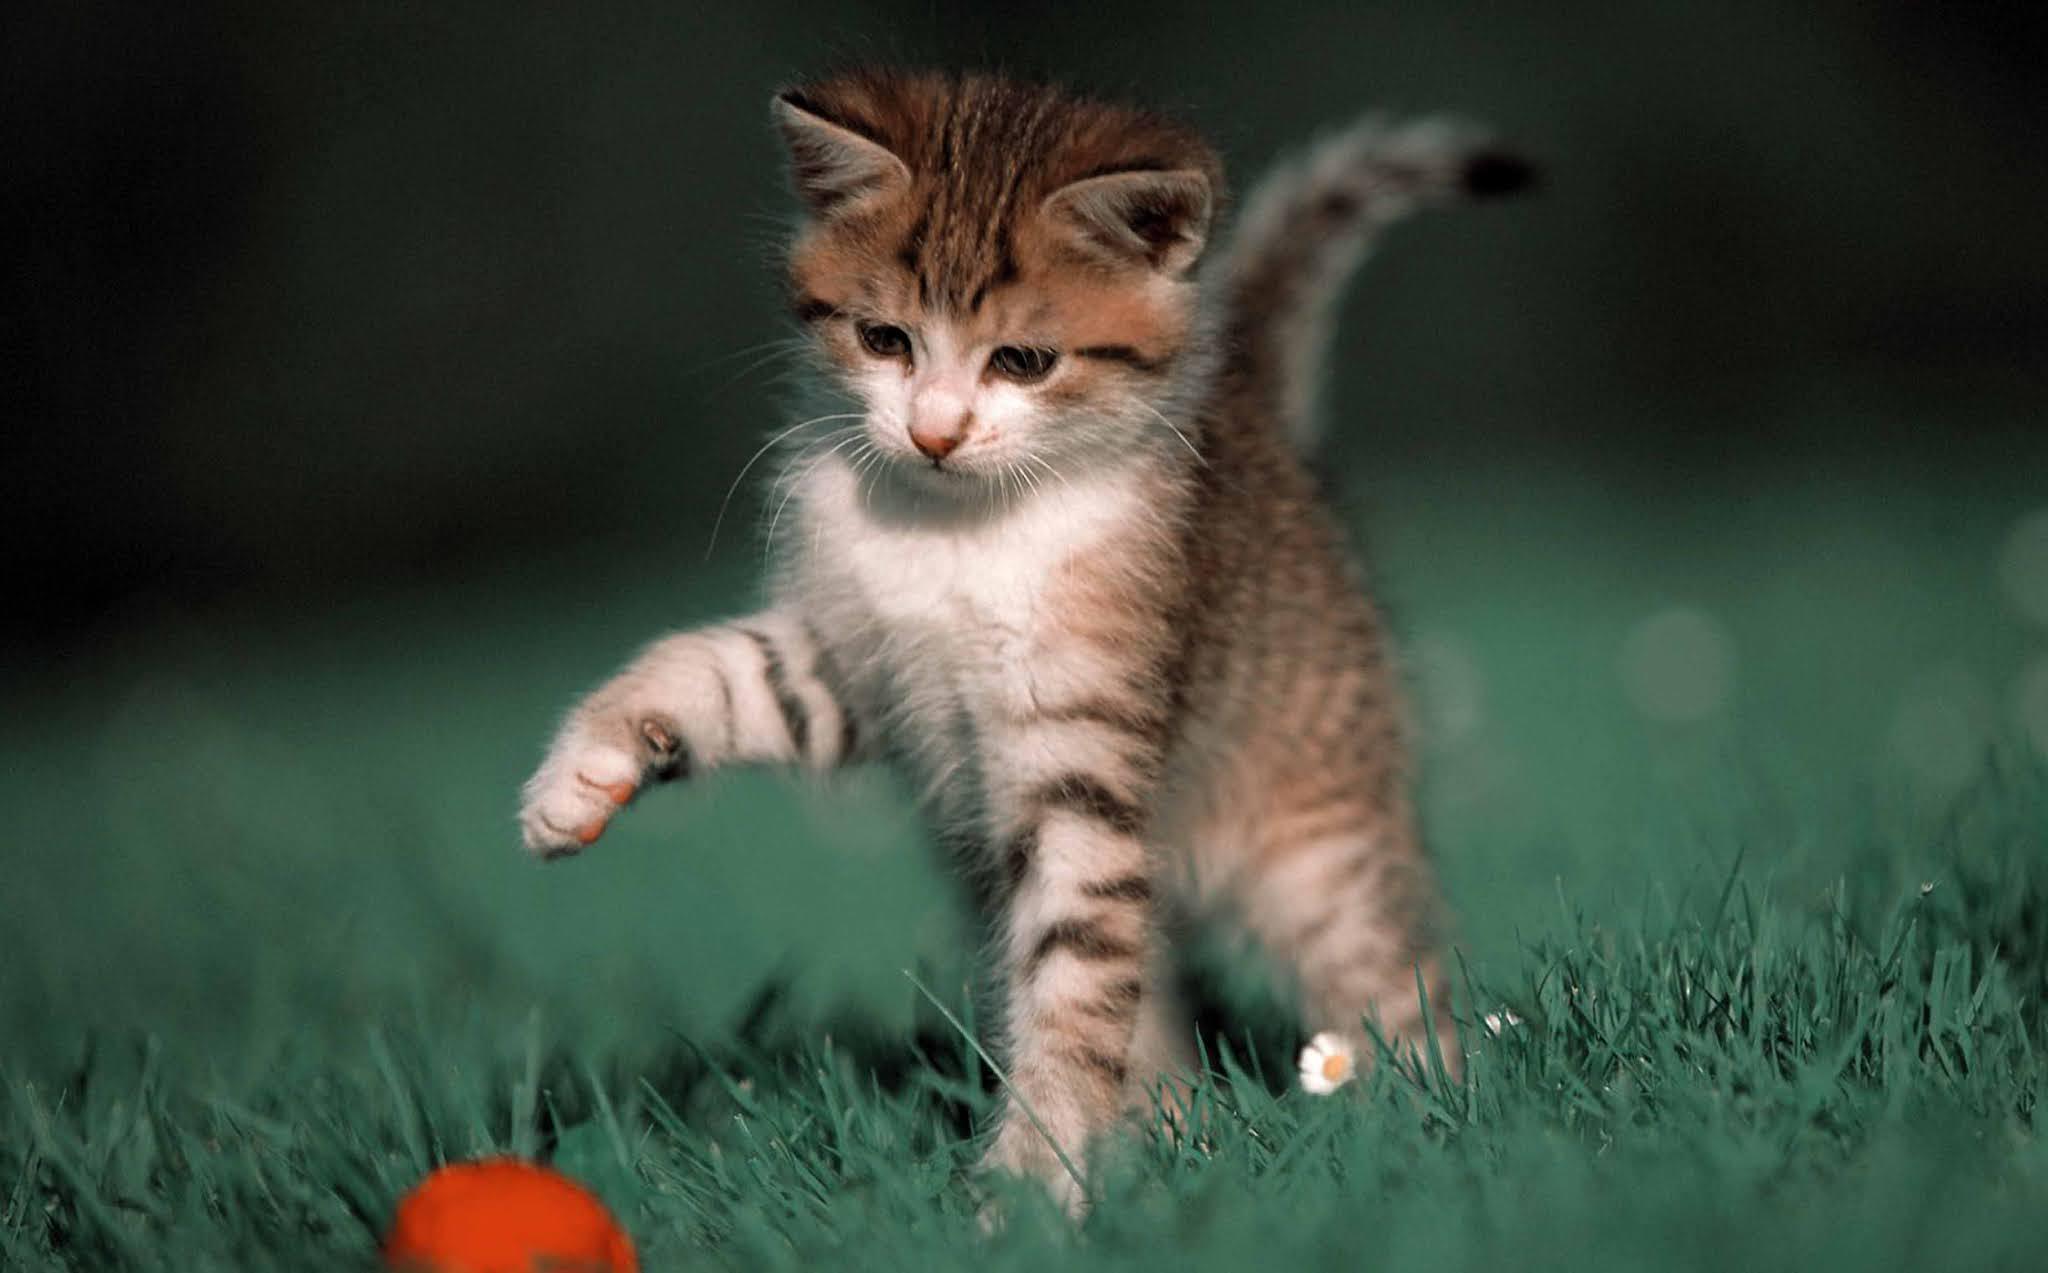 21 Free wallpaper image kitten, cat, glance, cute, animal wallpaper HD, background Ultra HD 4K 5K 8K for Computer Desktop